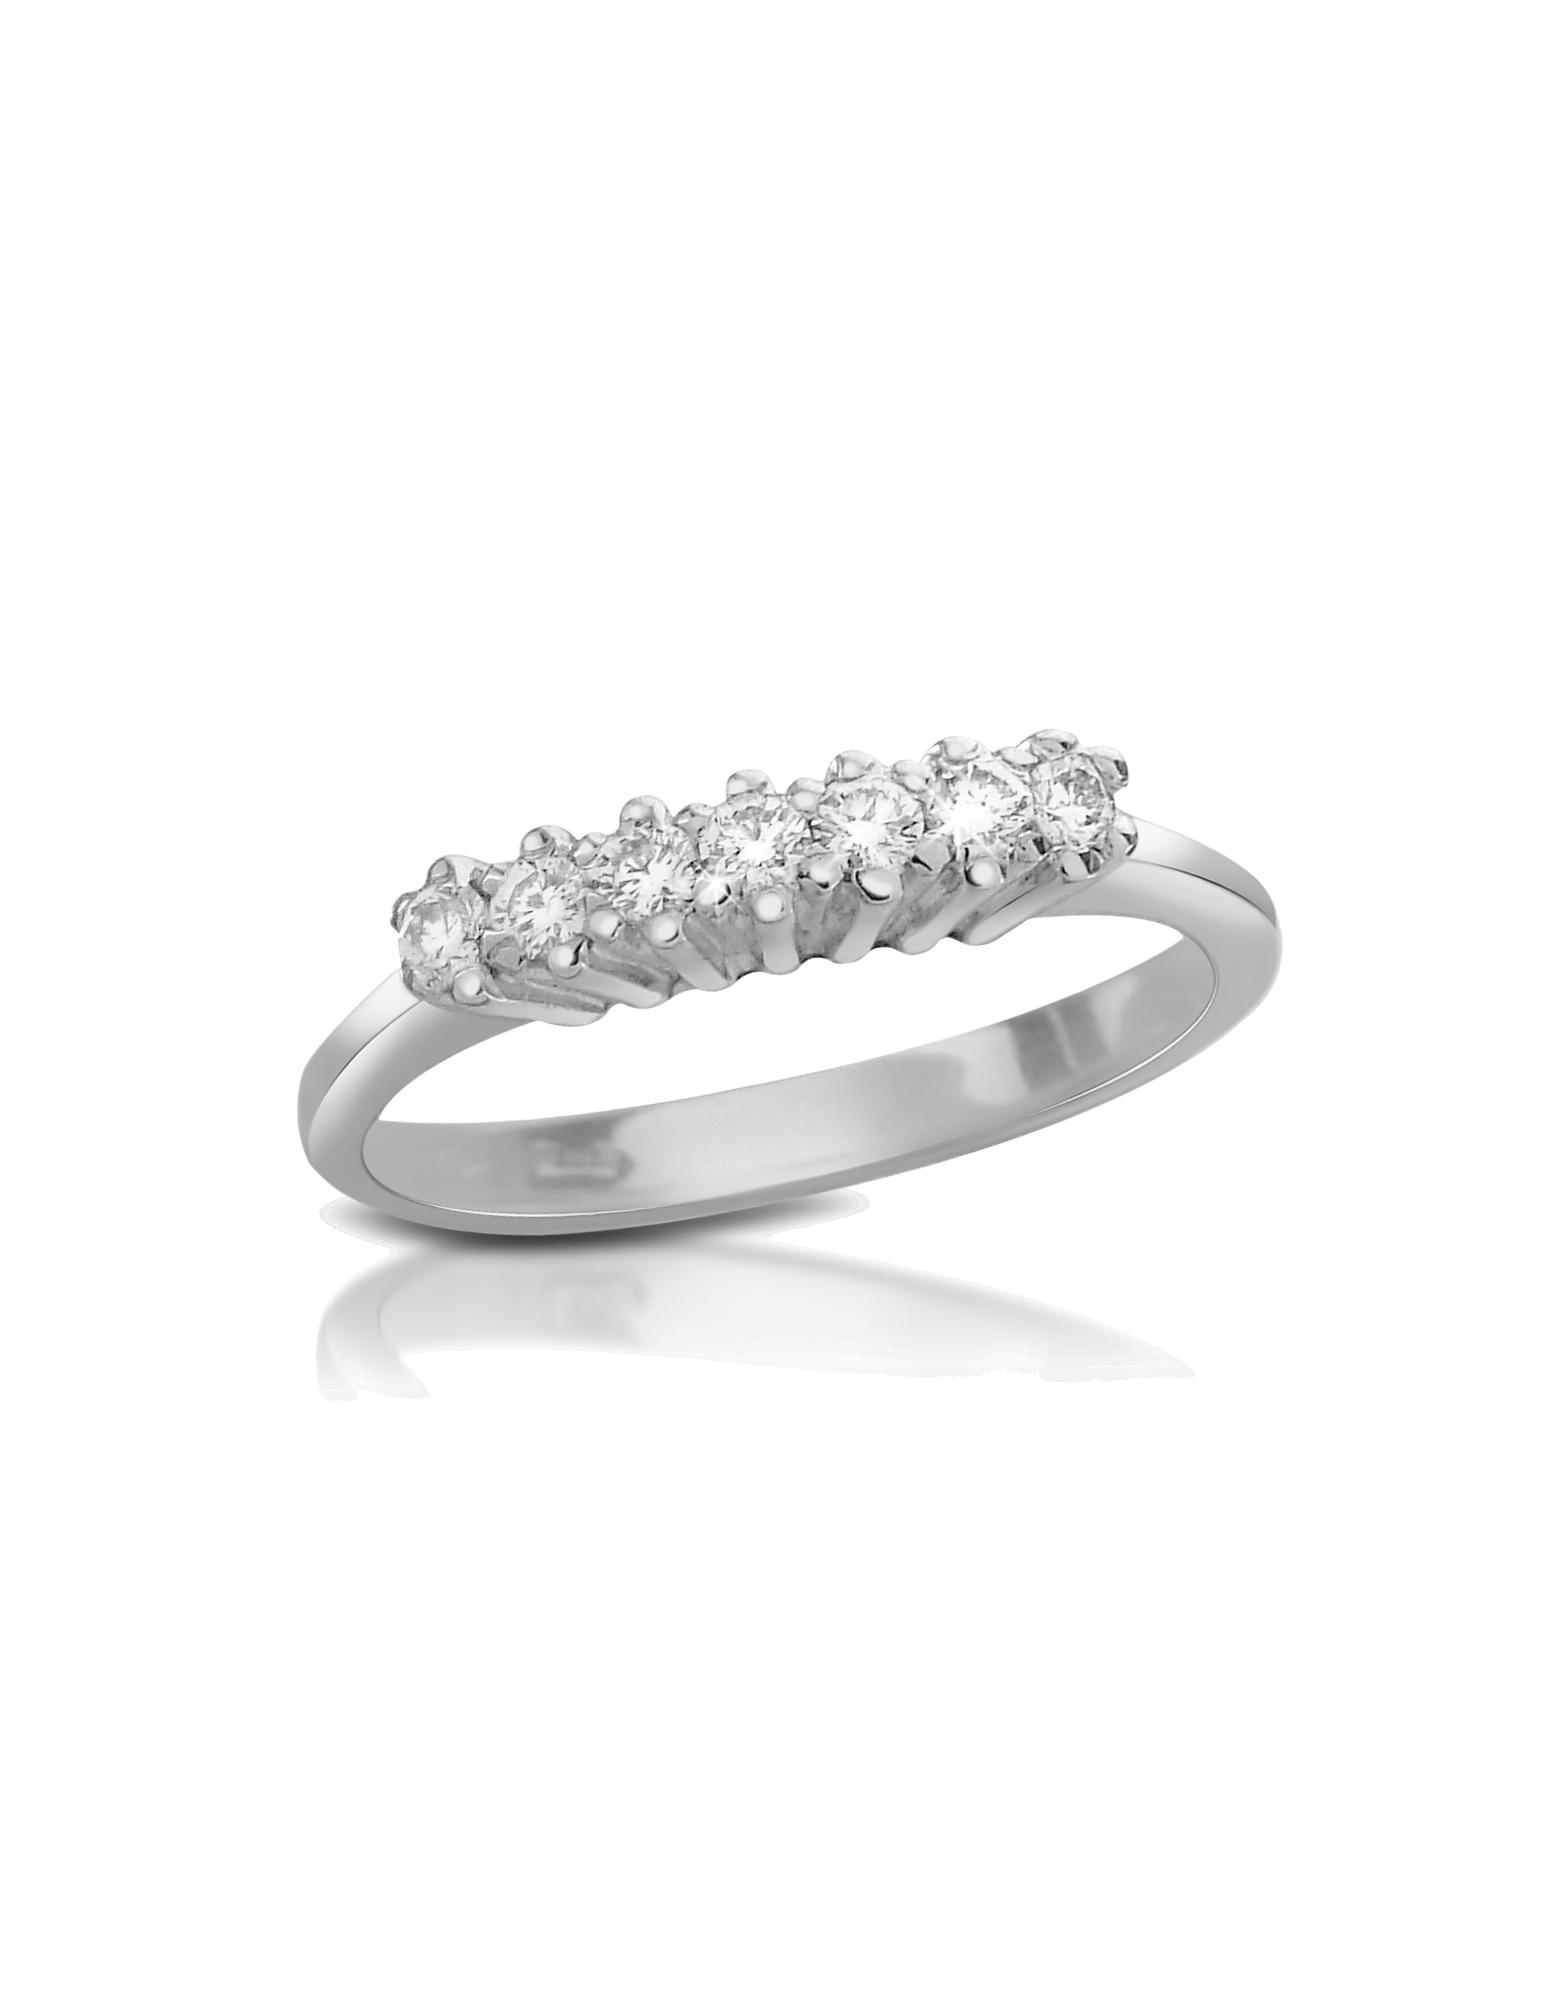 Image of 0.10 ct Diamond 18K Gold Band Ring